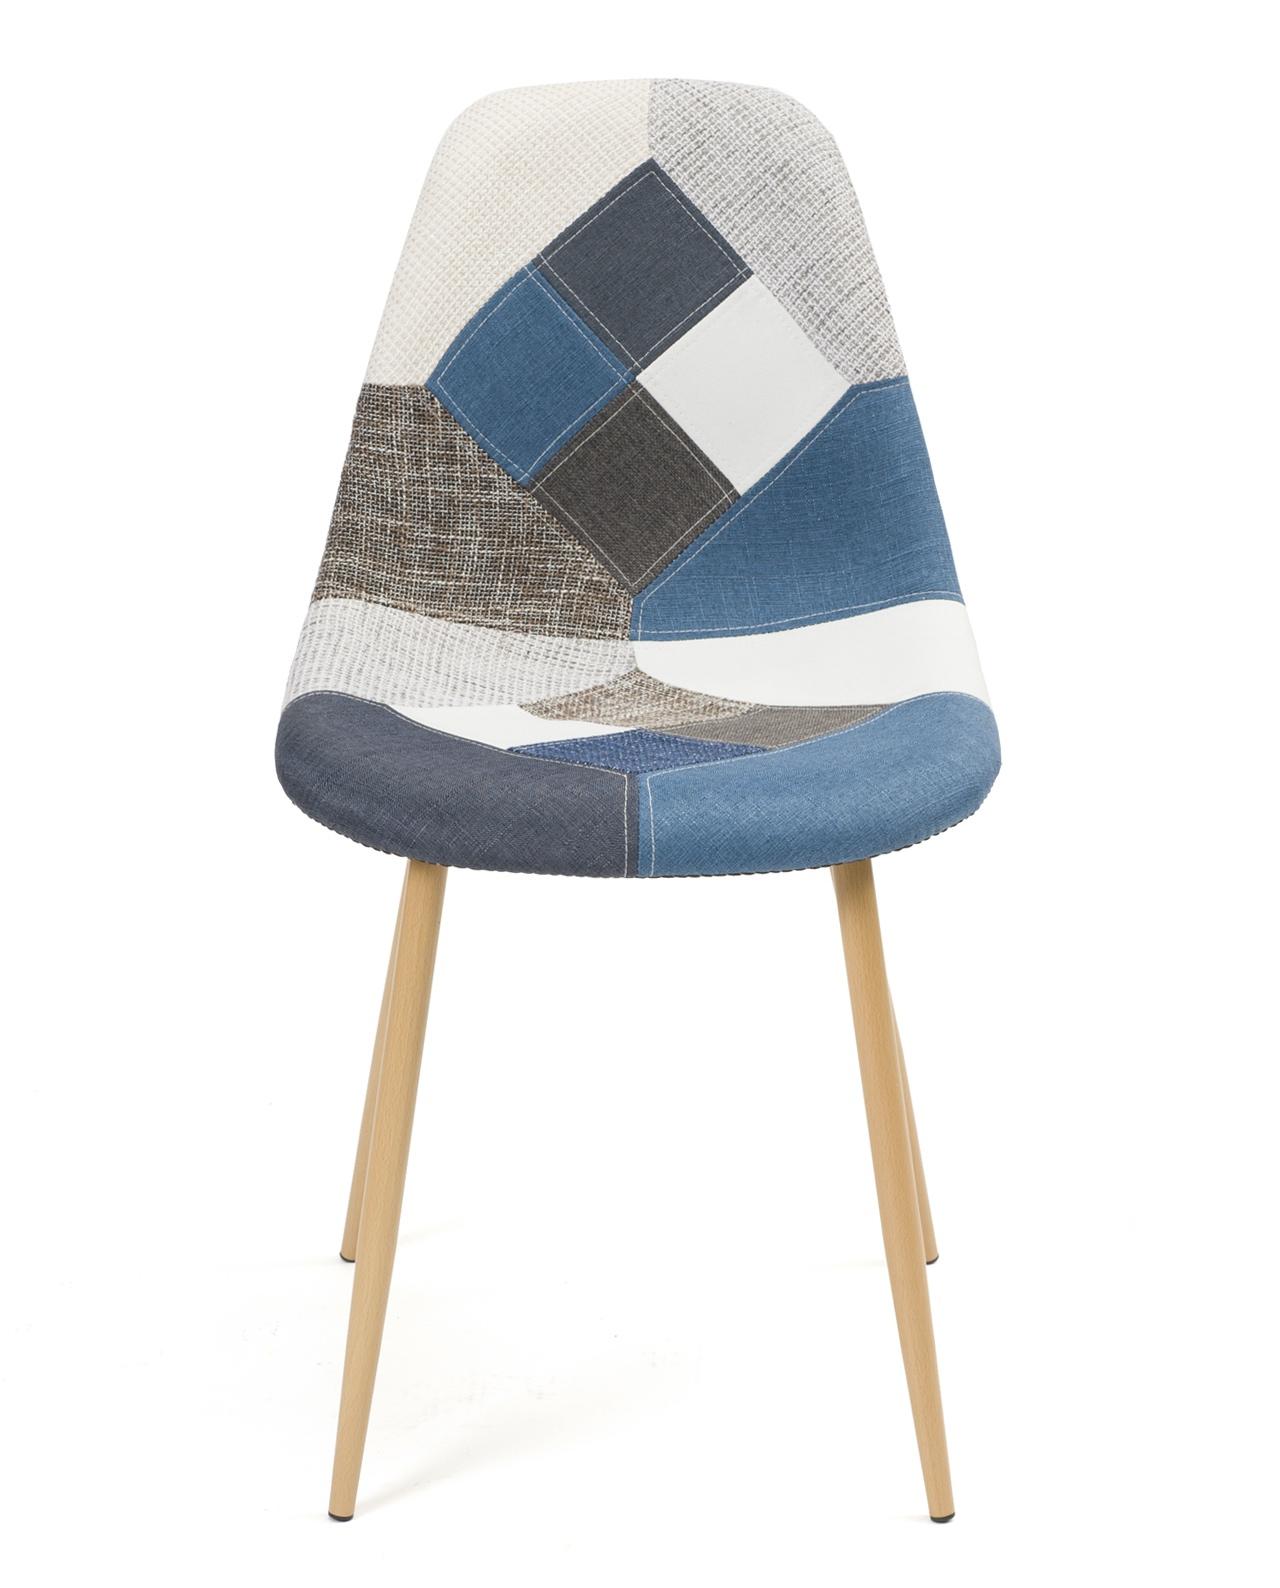 Chaise Patchwork Bleu Style Scandinave Nova Lot De 2 Kayelles Com